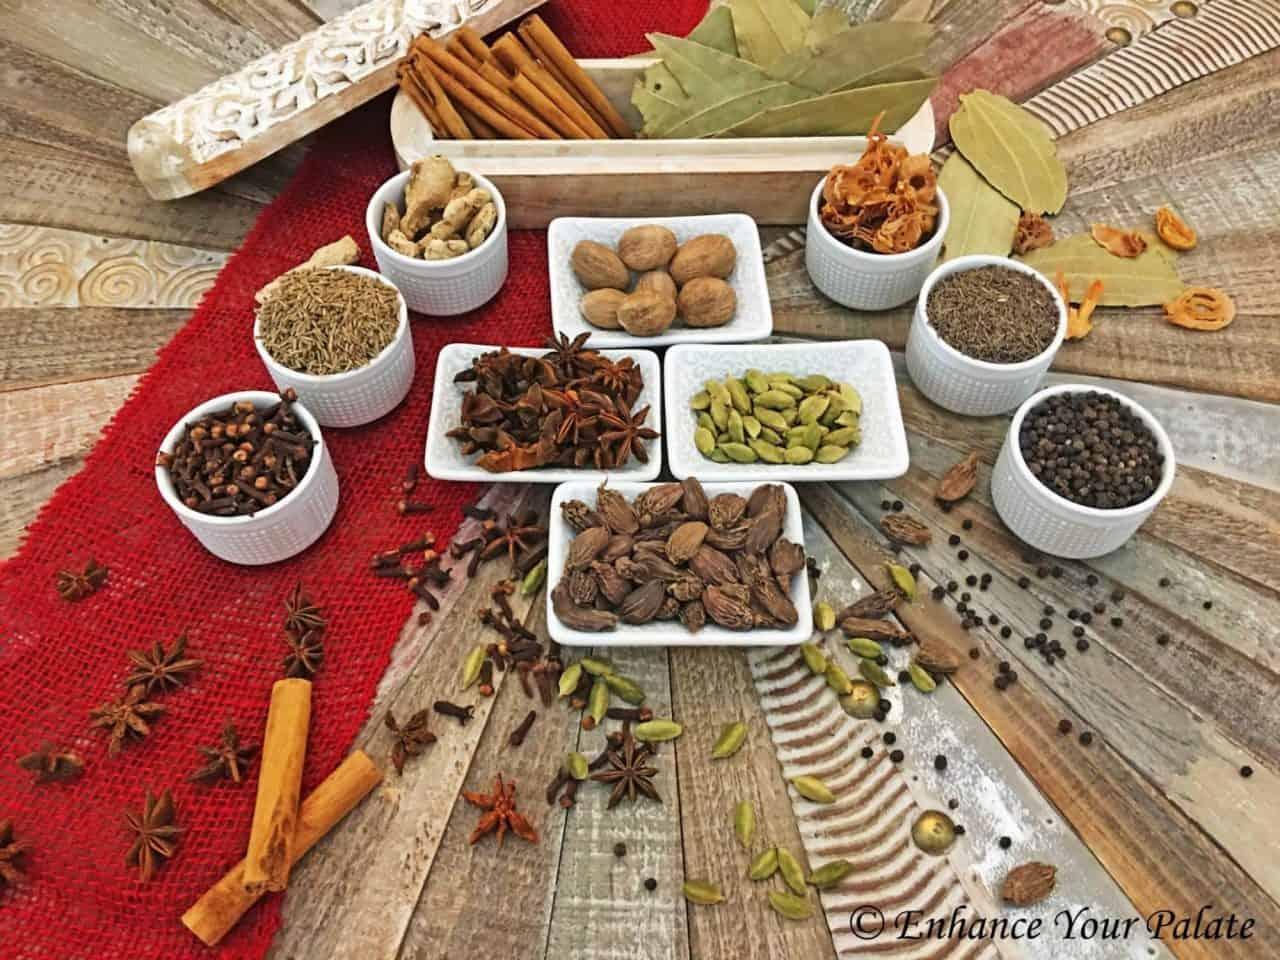 Warm Spices used to make Garam Masala